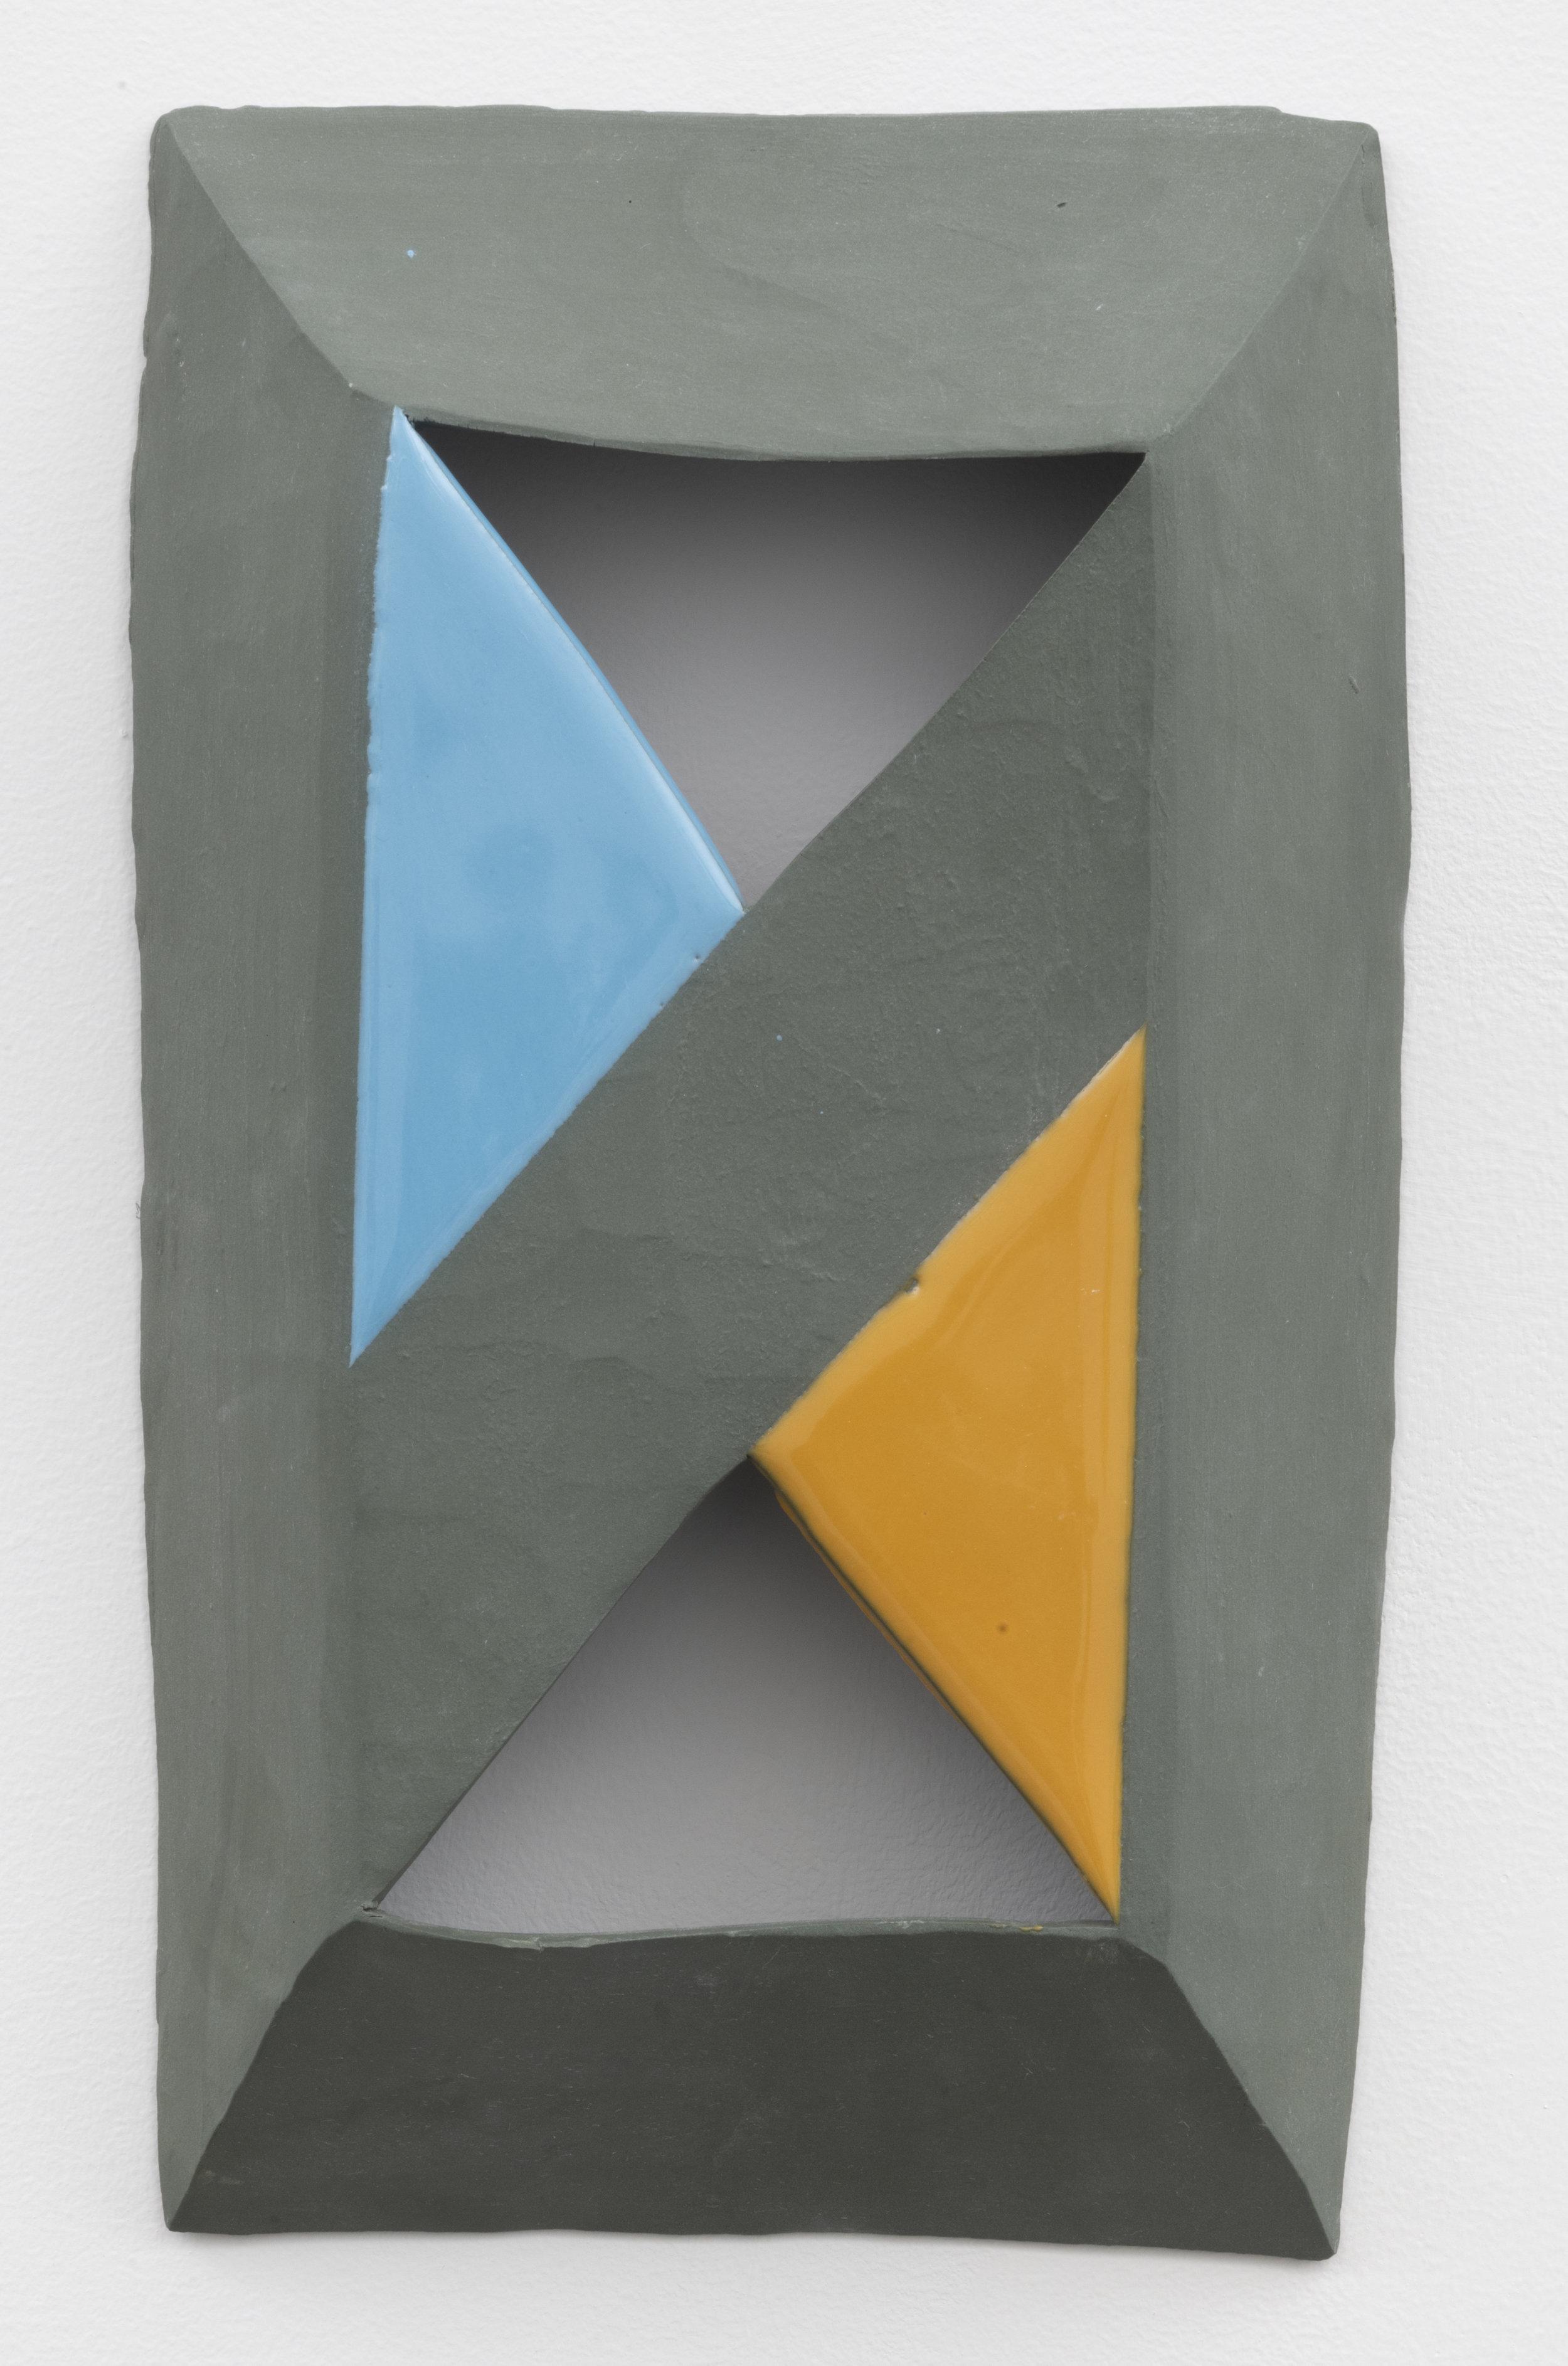 converge , 2018  glazed ceramic 12 x 7 inches